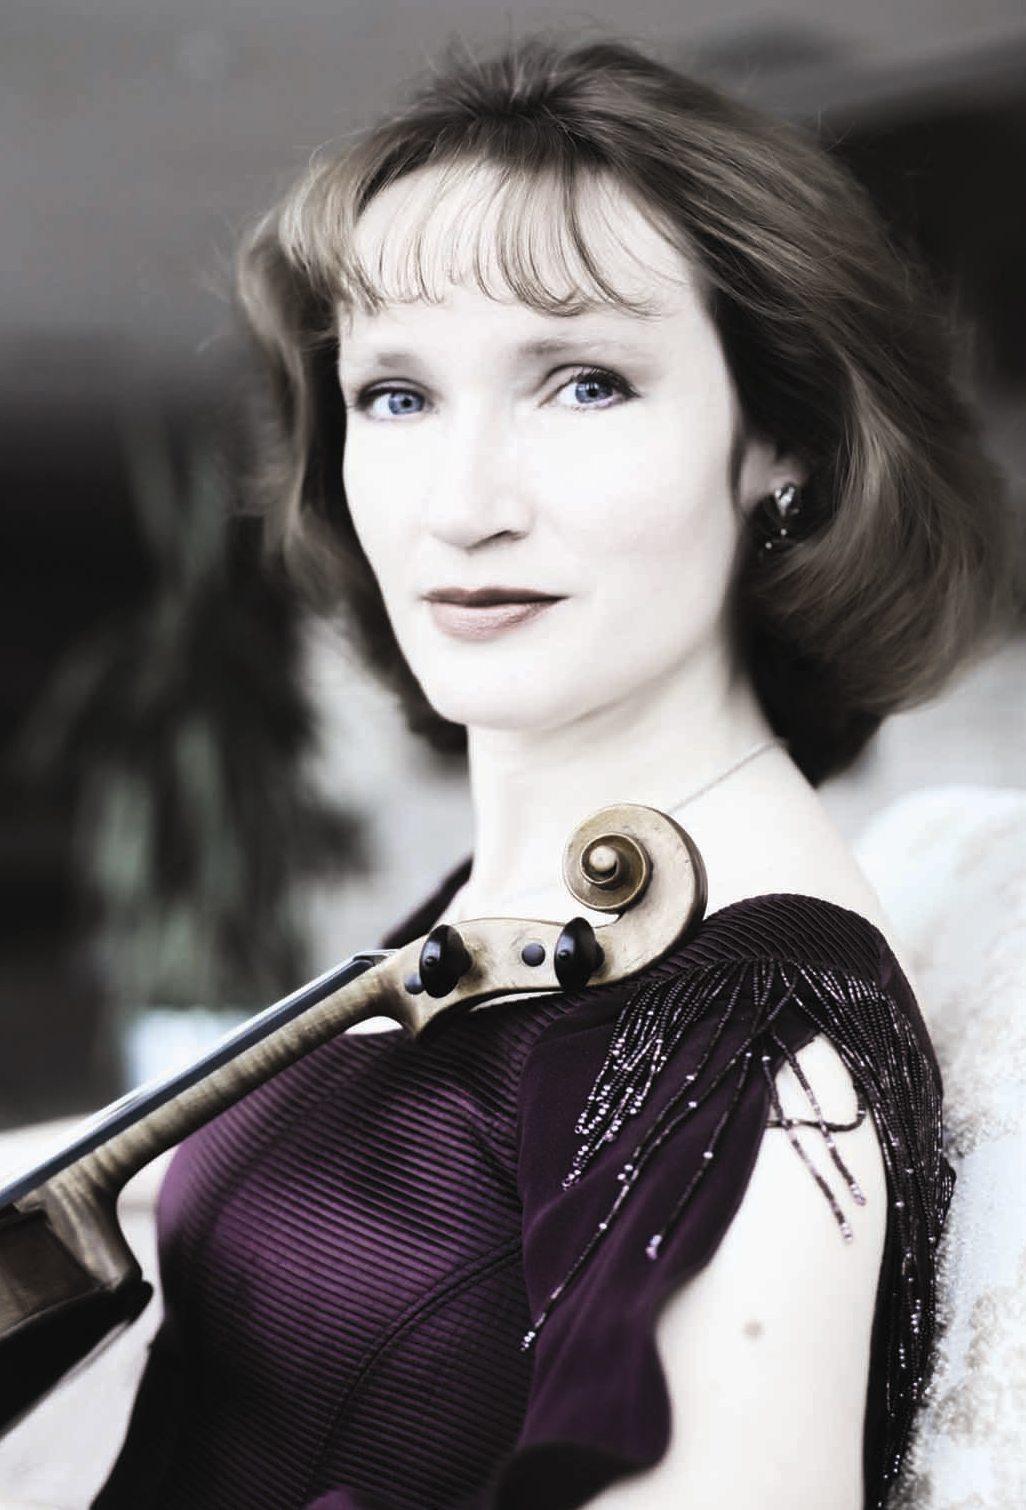 Irina Pavlikhina